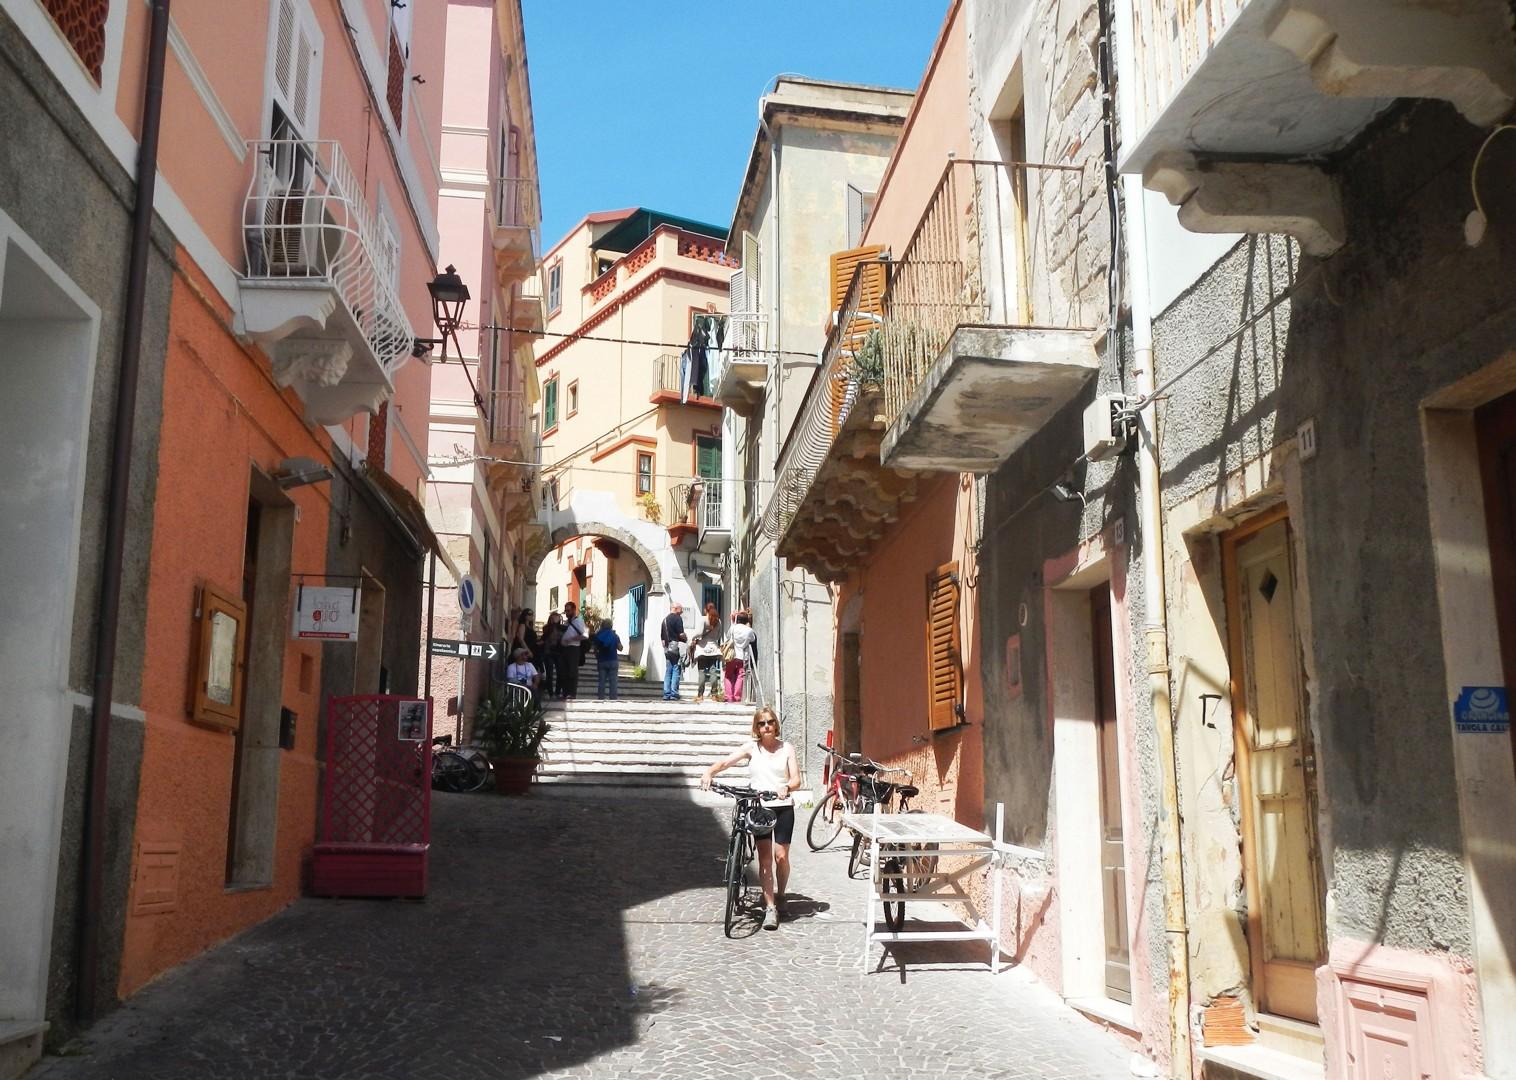 calaforte-san-pietro-town-sardinia.jpg - Italy - Sardinia - Island Flavours - Self-Guided Leisure Cycling Holiday - Italia Leisure and Family Cycling